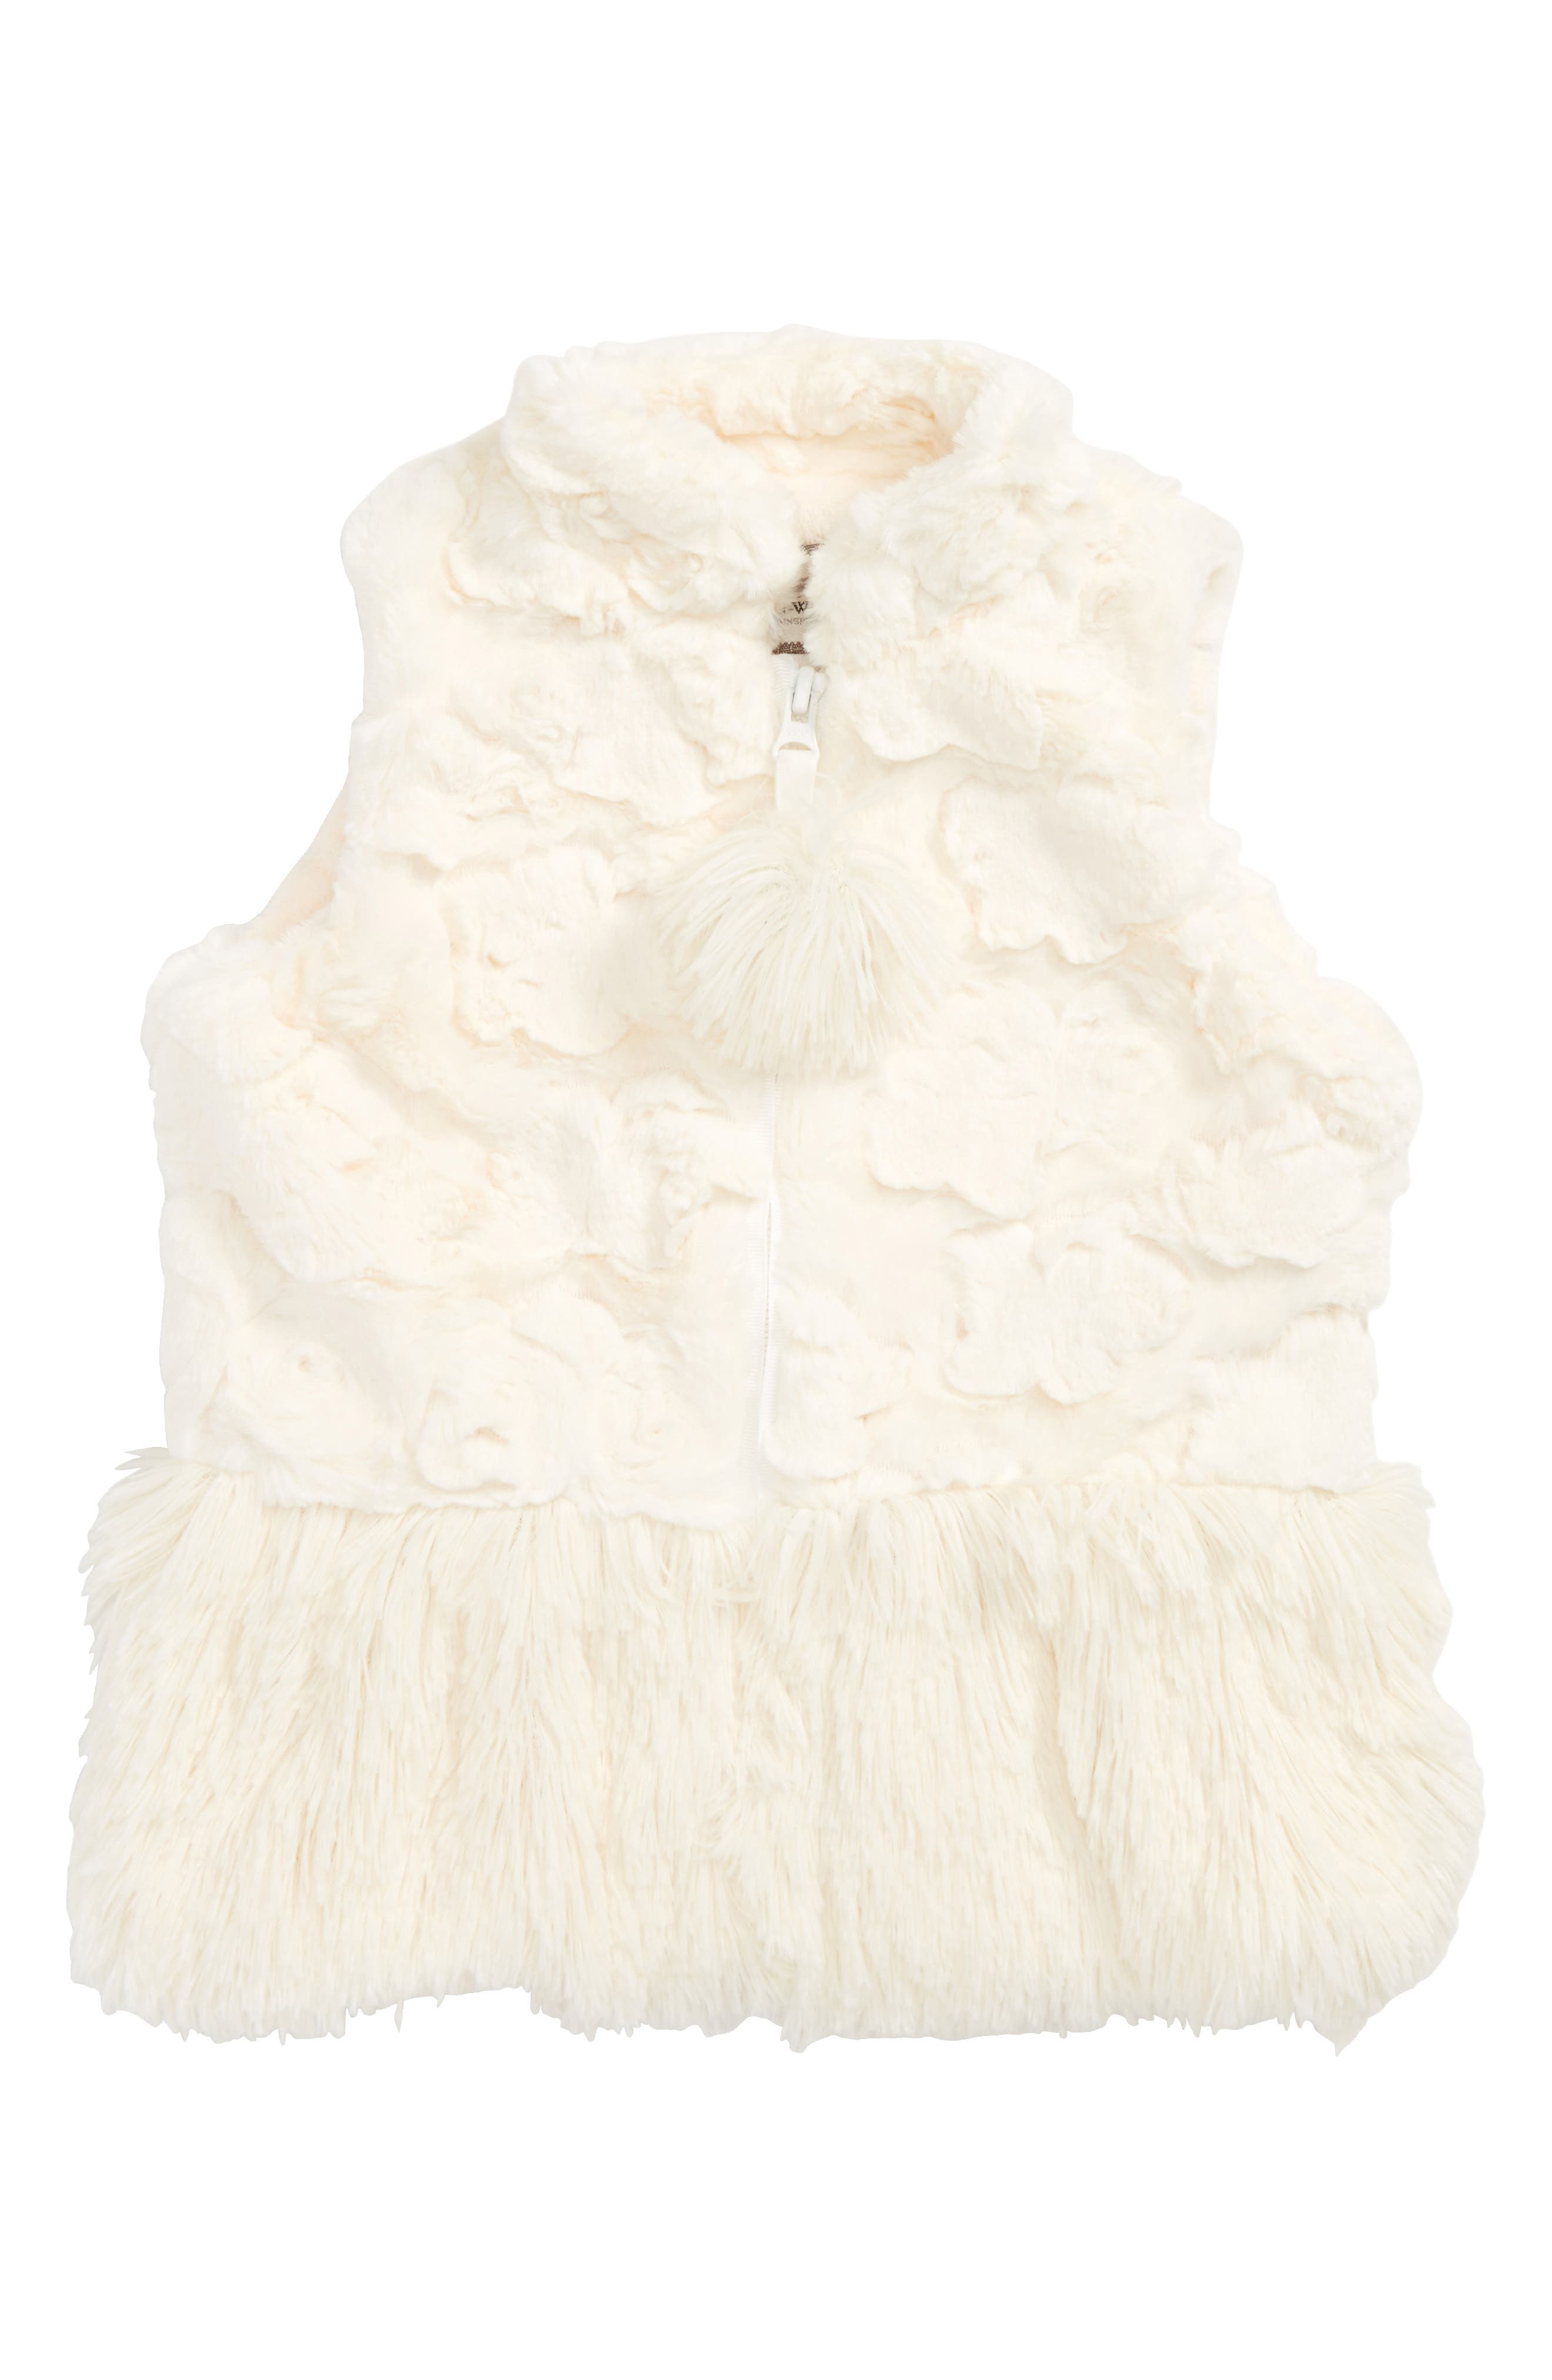 Main Image - Widgeon Faux Fur Peplum Vest (Toddler Girls & Little Girls)